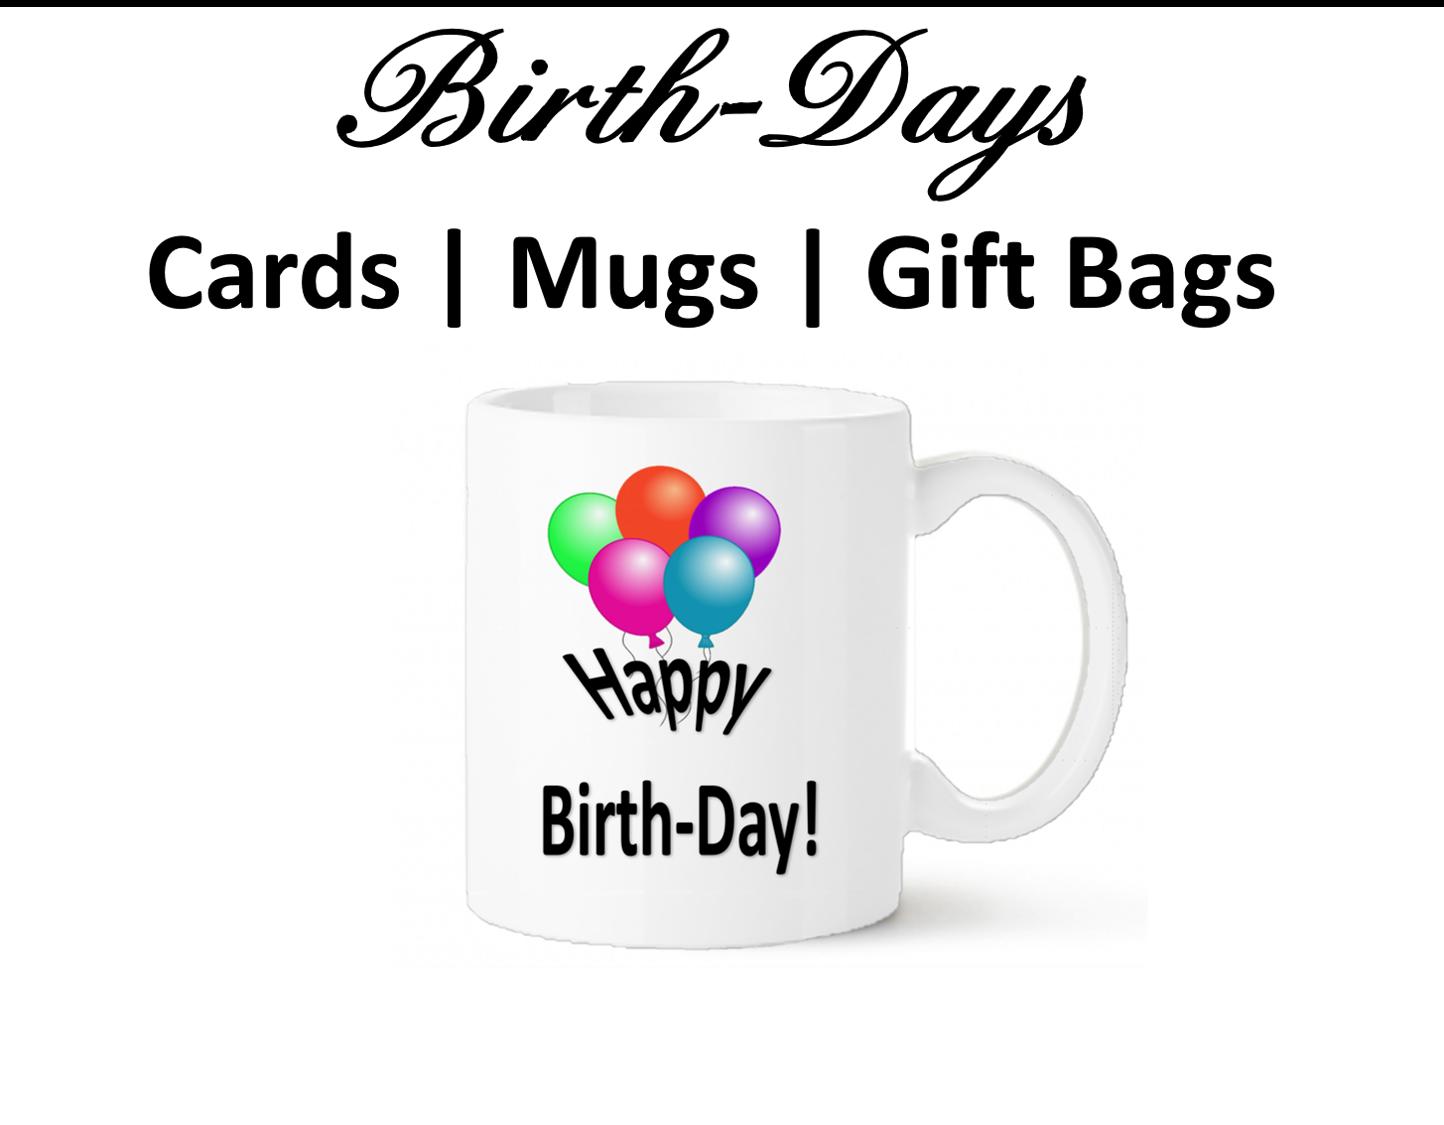 BIRTH-DAYS SHOP PAGE